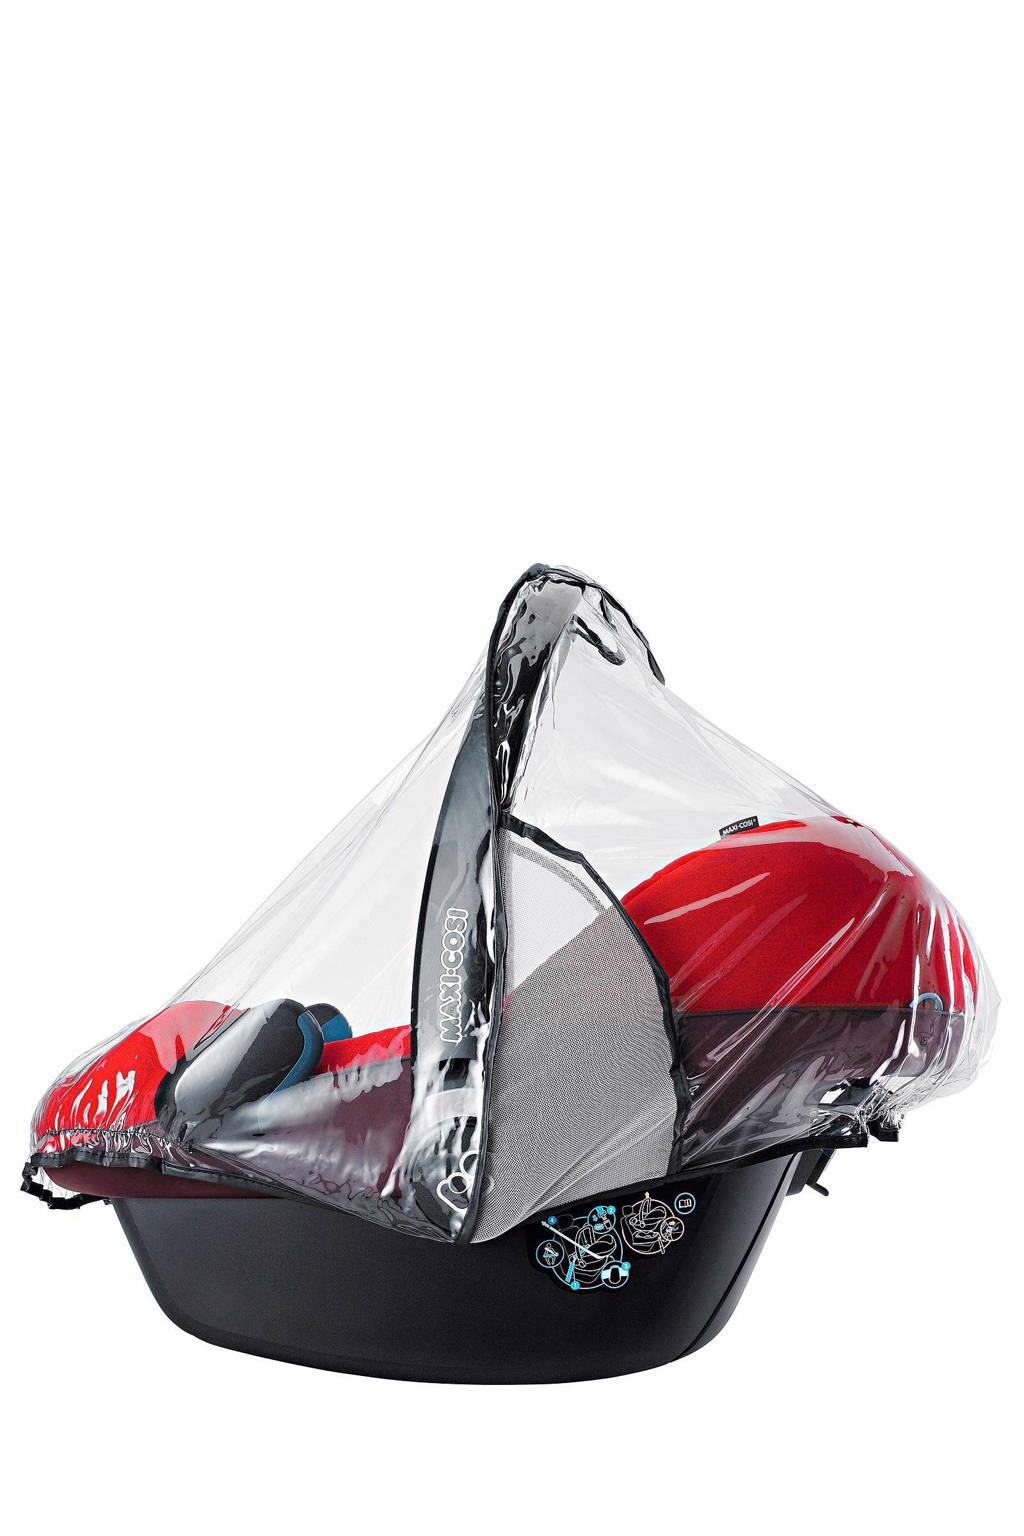 Maxi-Cosi autostoeltje groep 0+ regenhoes, Transparant